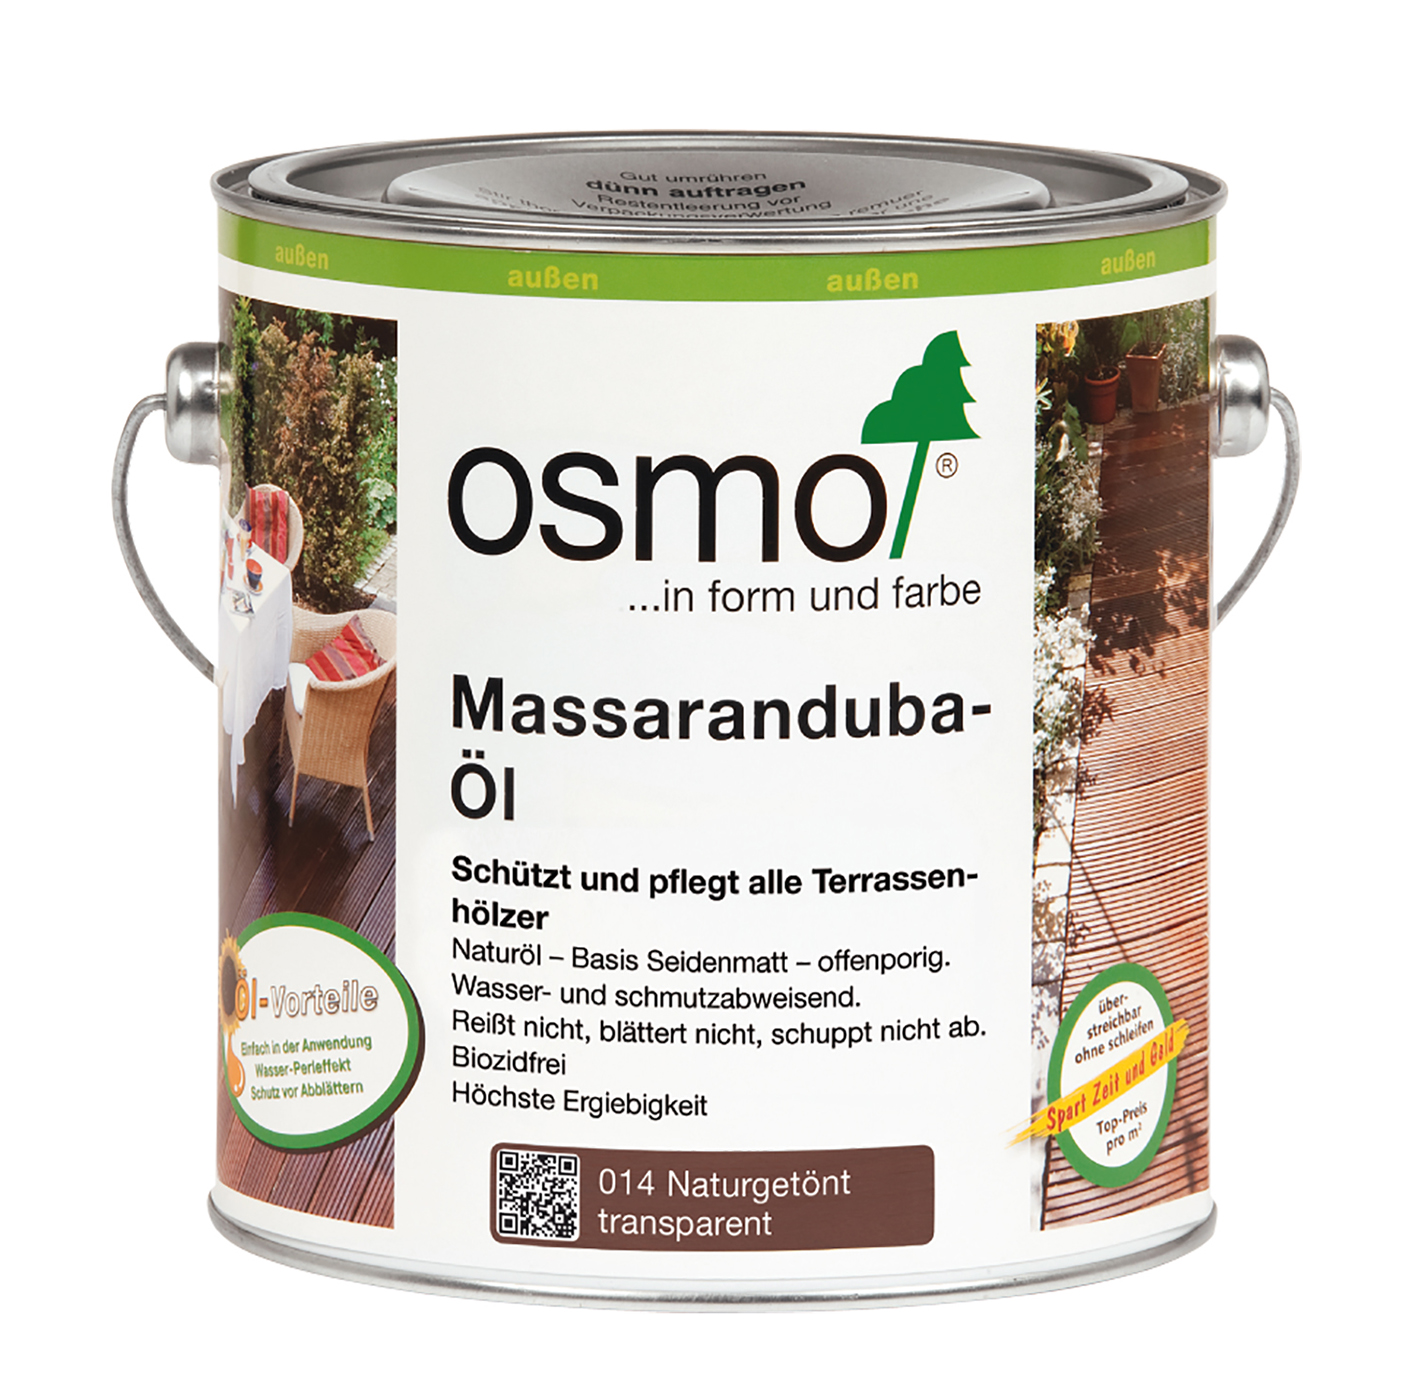 Osmo Massaranduba-Öl 2,5 Ltr.